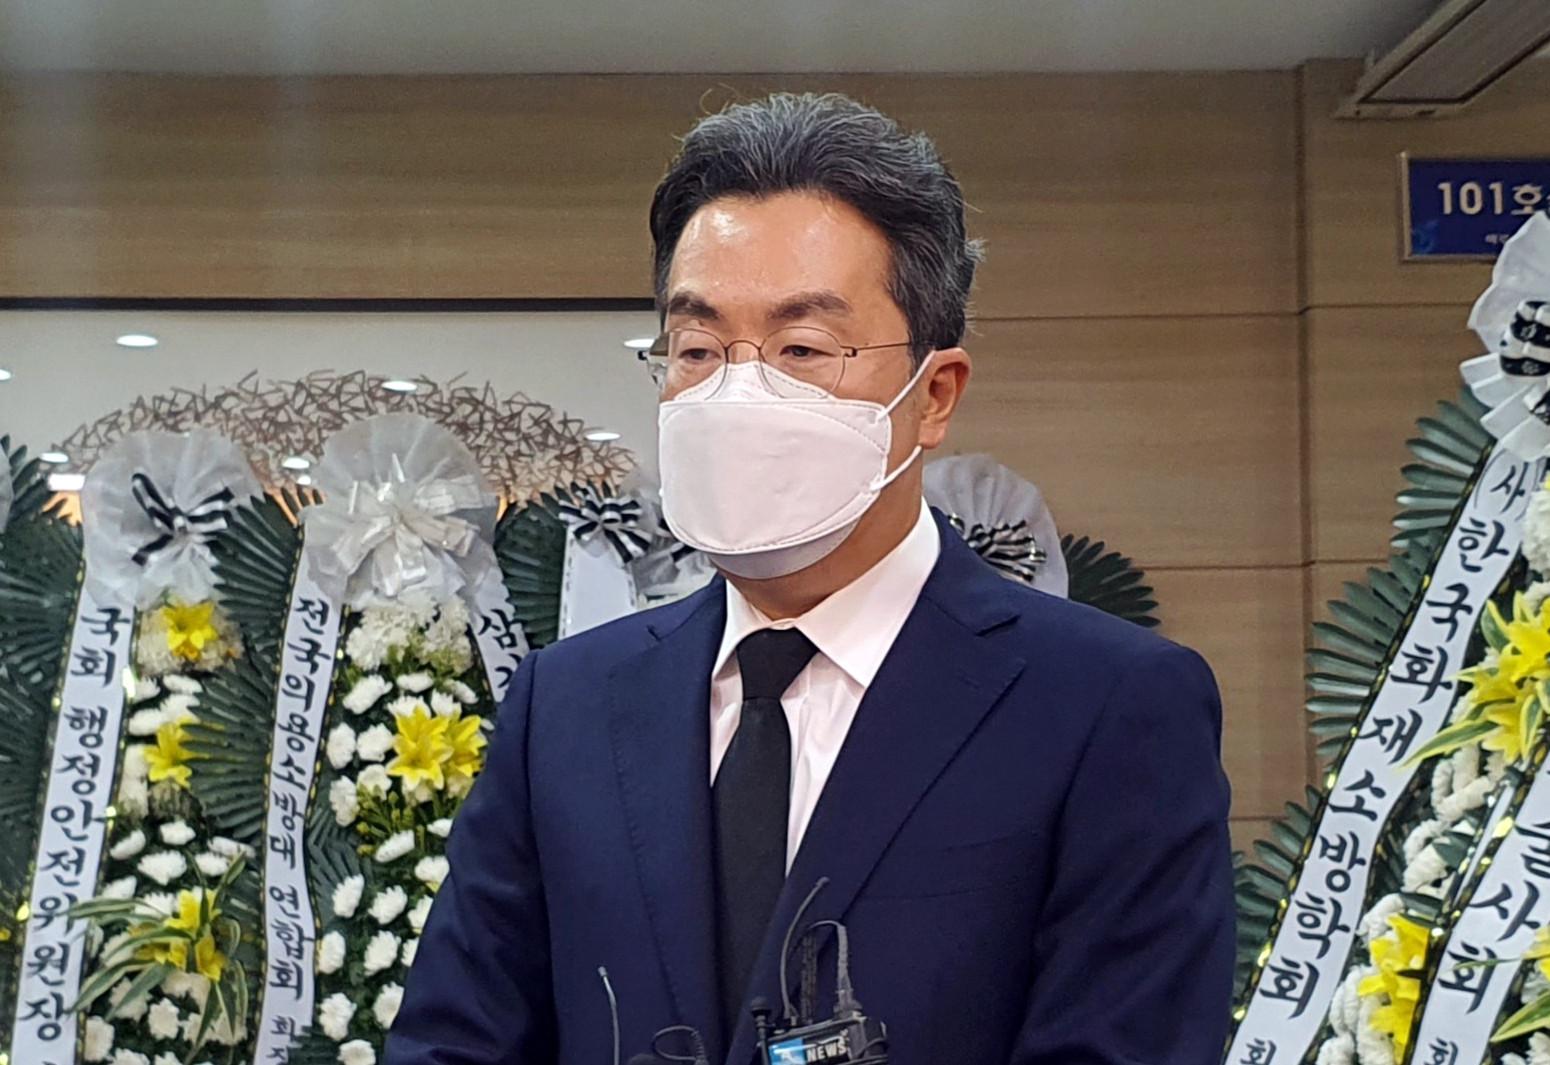 ▲▼Coupang代表理事社長姜翰承前往殉職消防員金東植的靈堂致哀。(圖/達志影像/newscom)